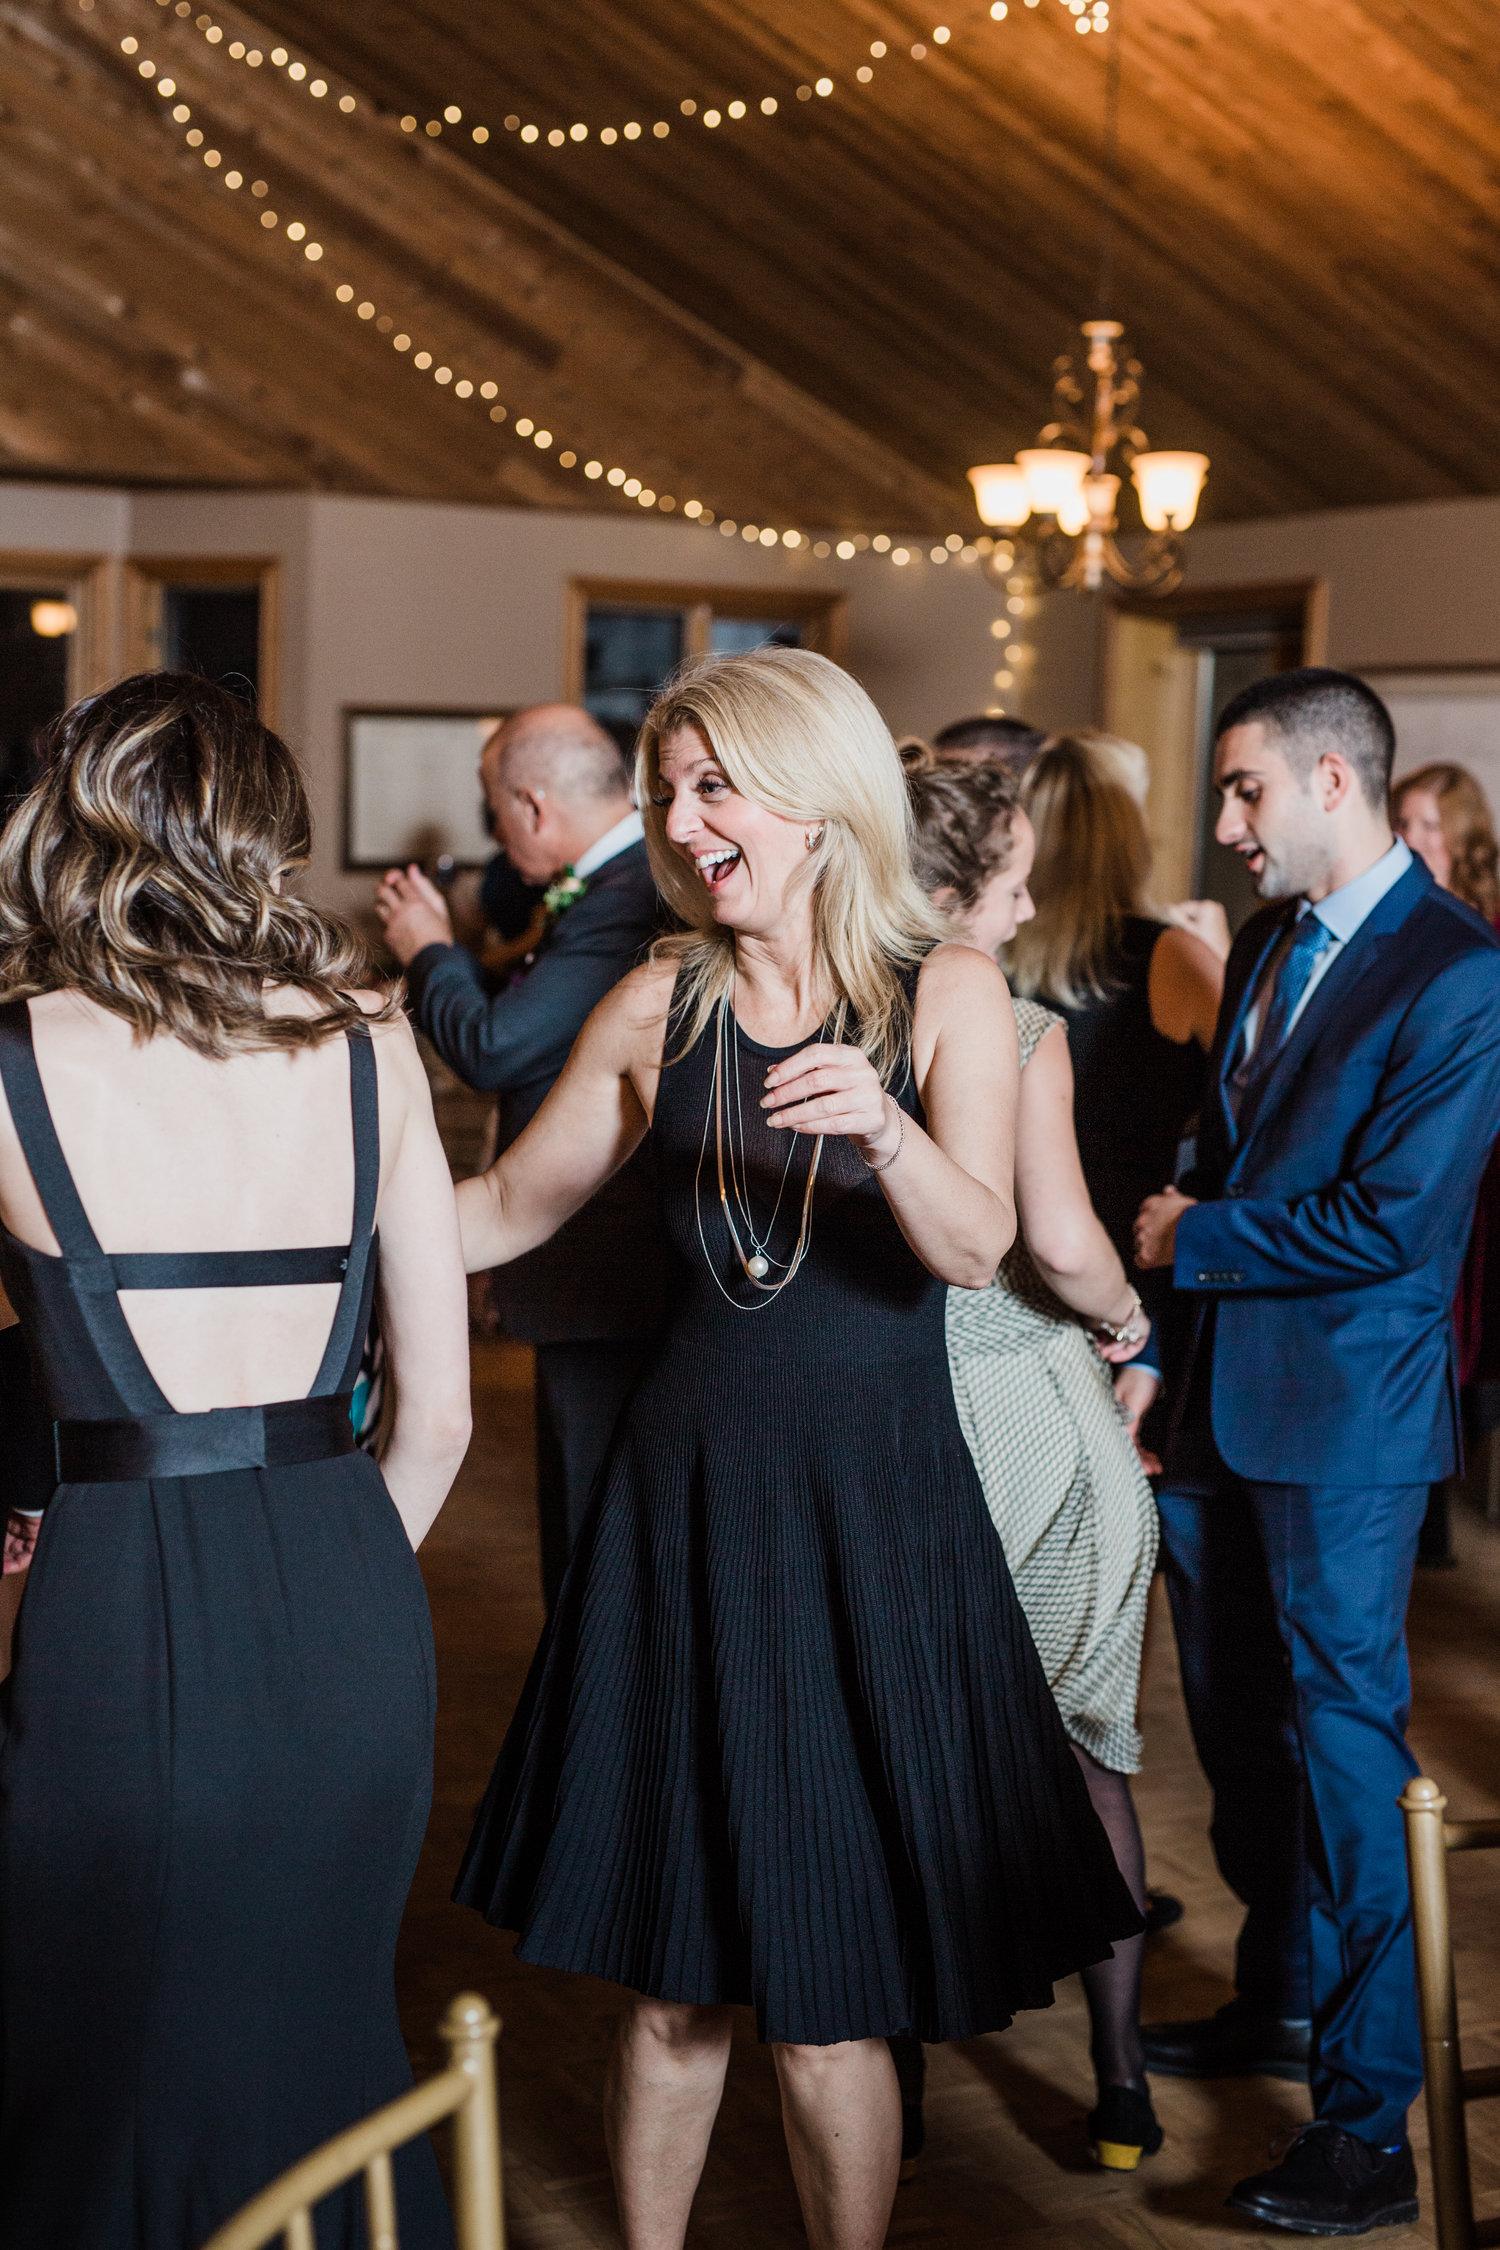 Amir-Golbazi-Danielle-Giroux-Photography_Toronto-Wedding_Cedarwood_Rachel-Paul_803.jpg